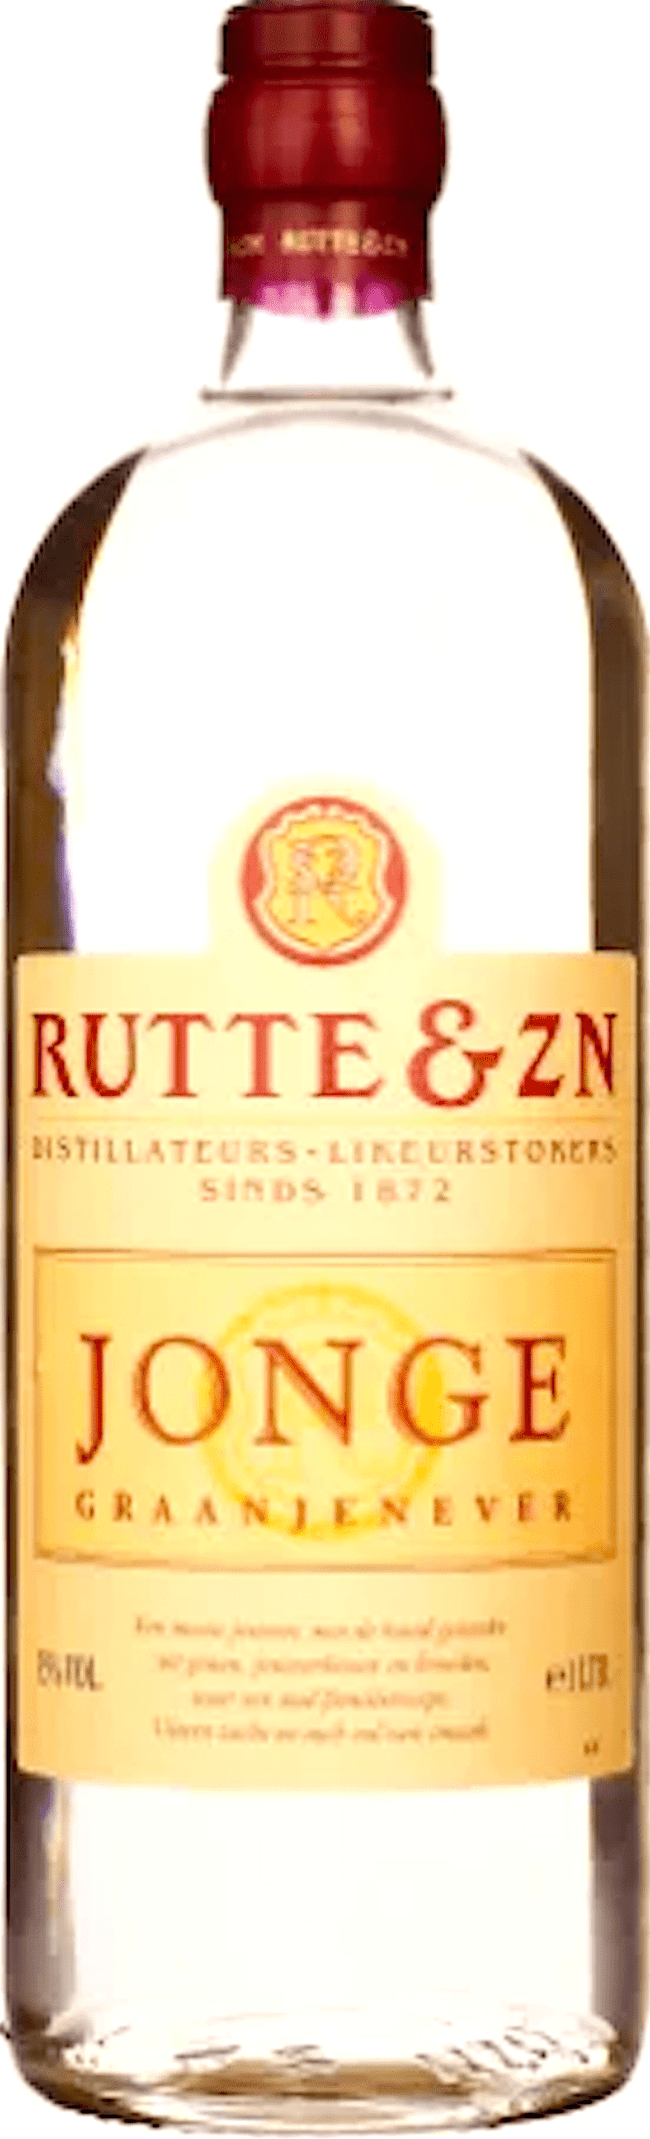 De Jonge jenever van Rutte & Zn (foto Drankdozijn)